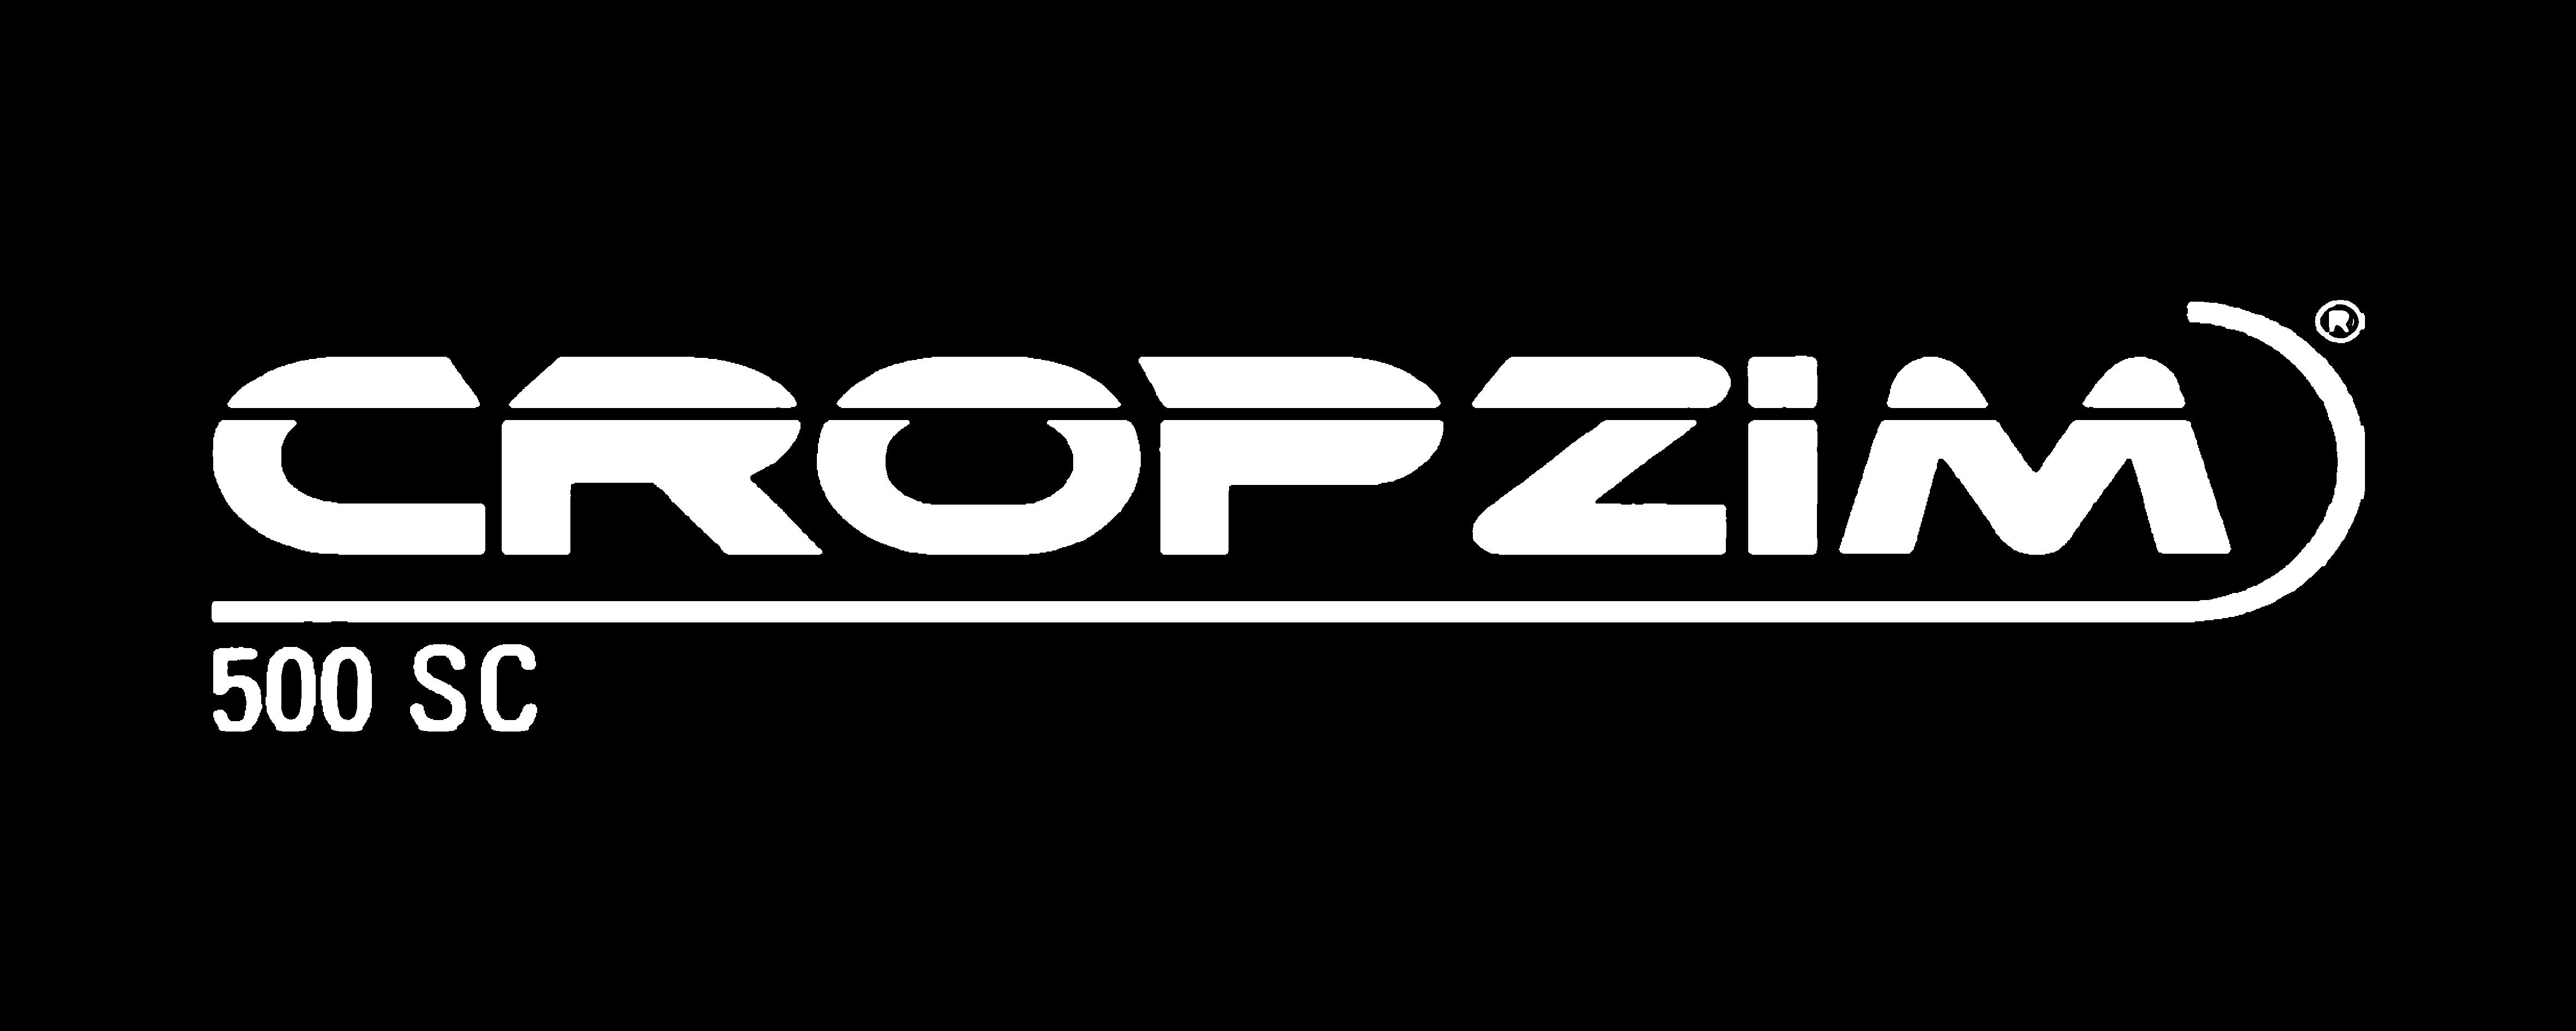 CROPZIM 500-SC